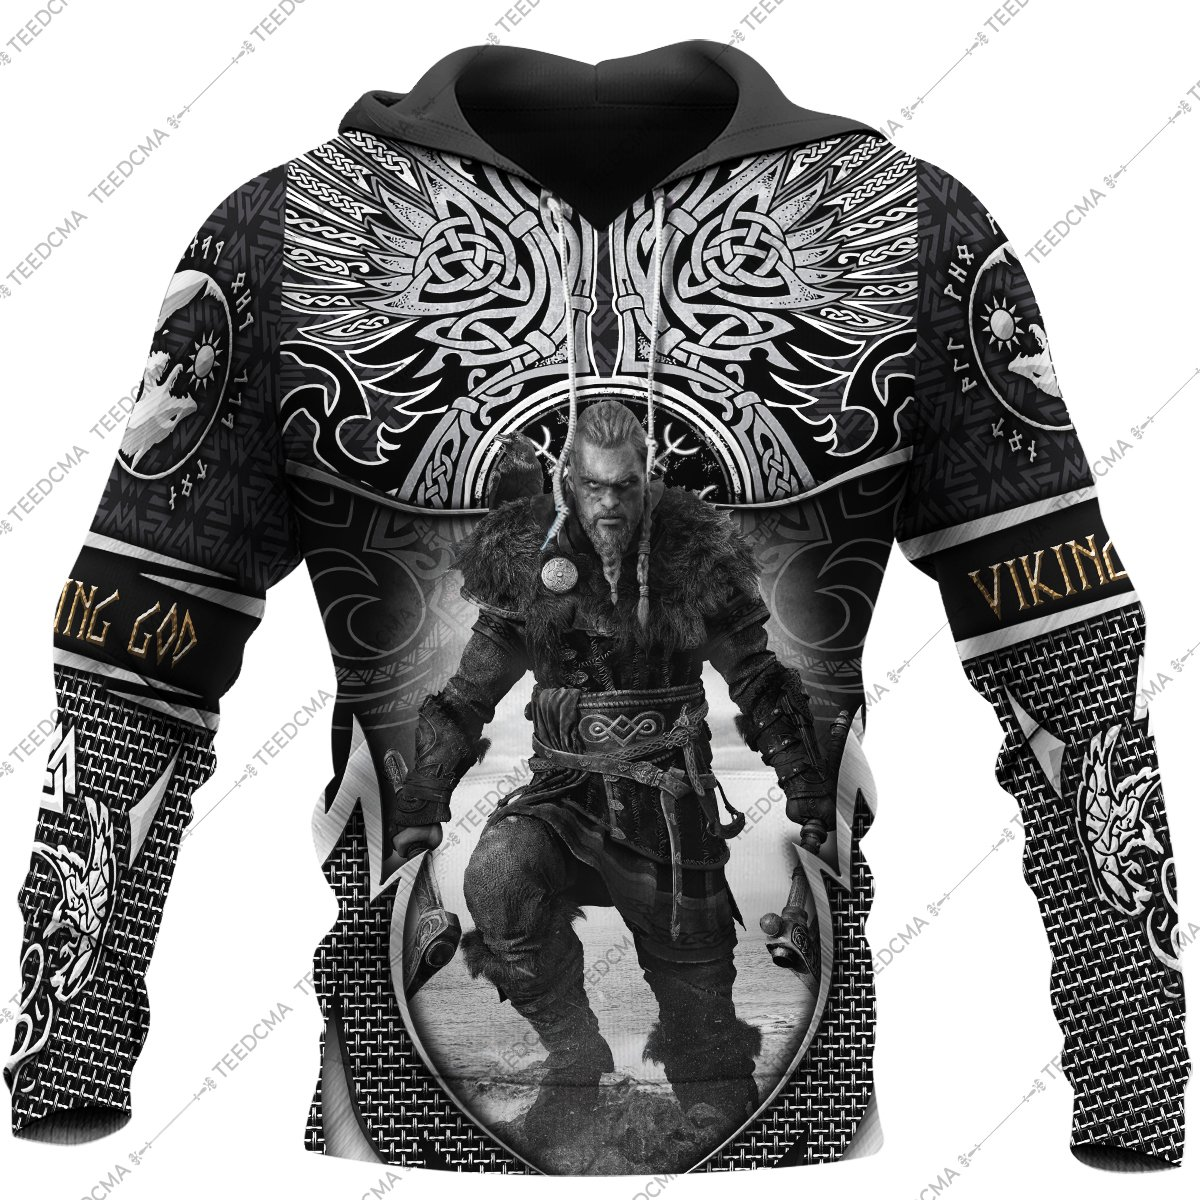 assassin's creed valhalla viking all over printed shirt 1